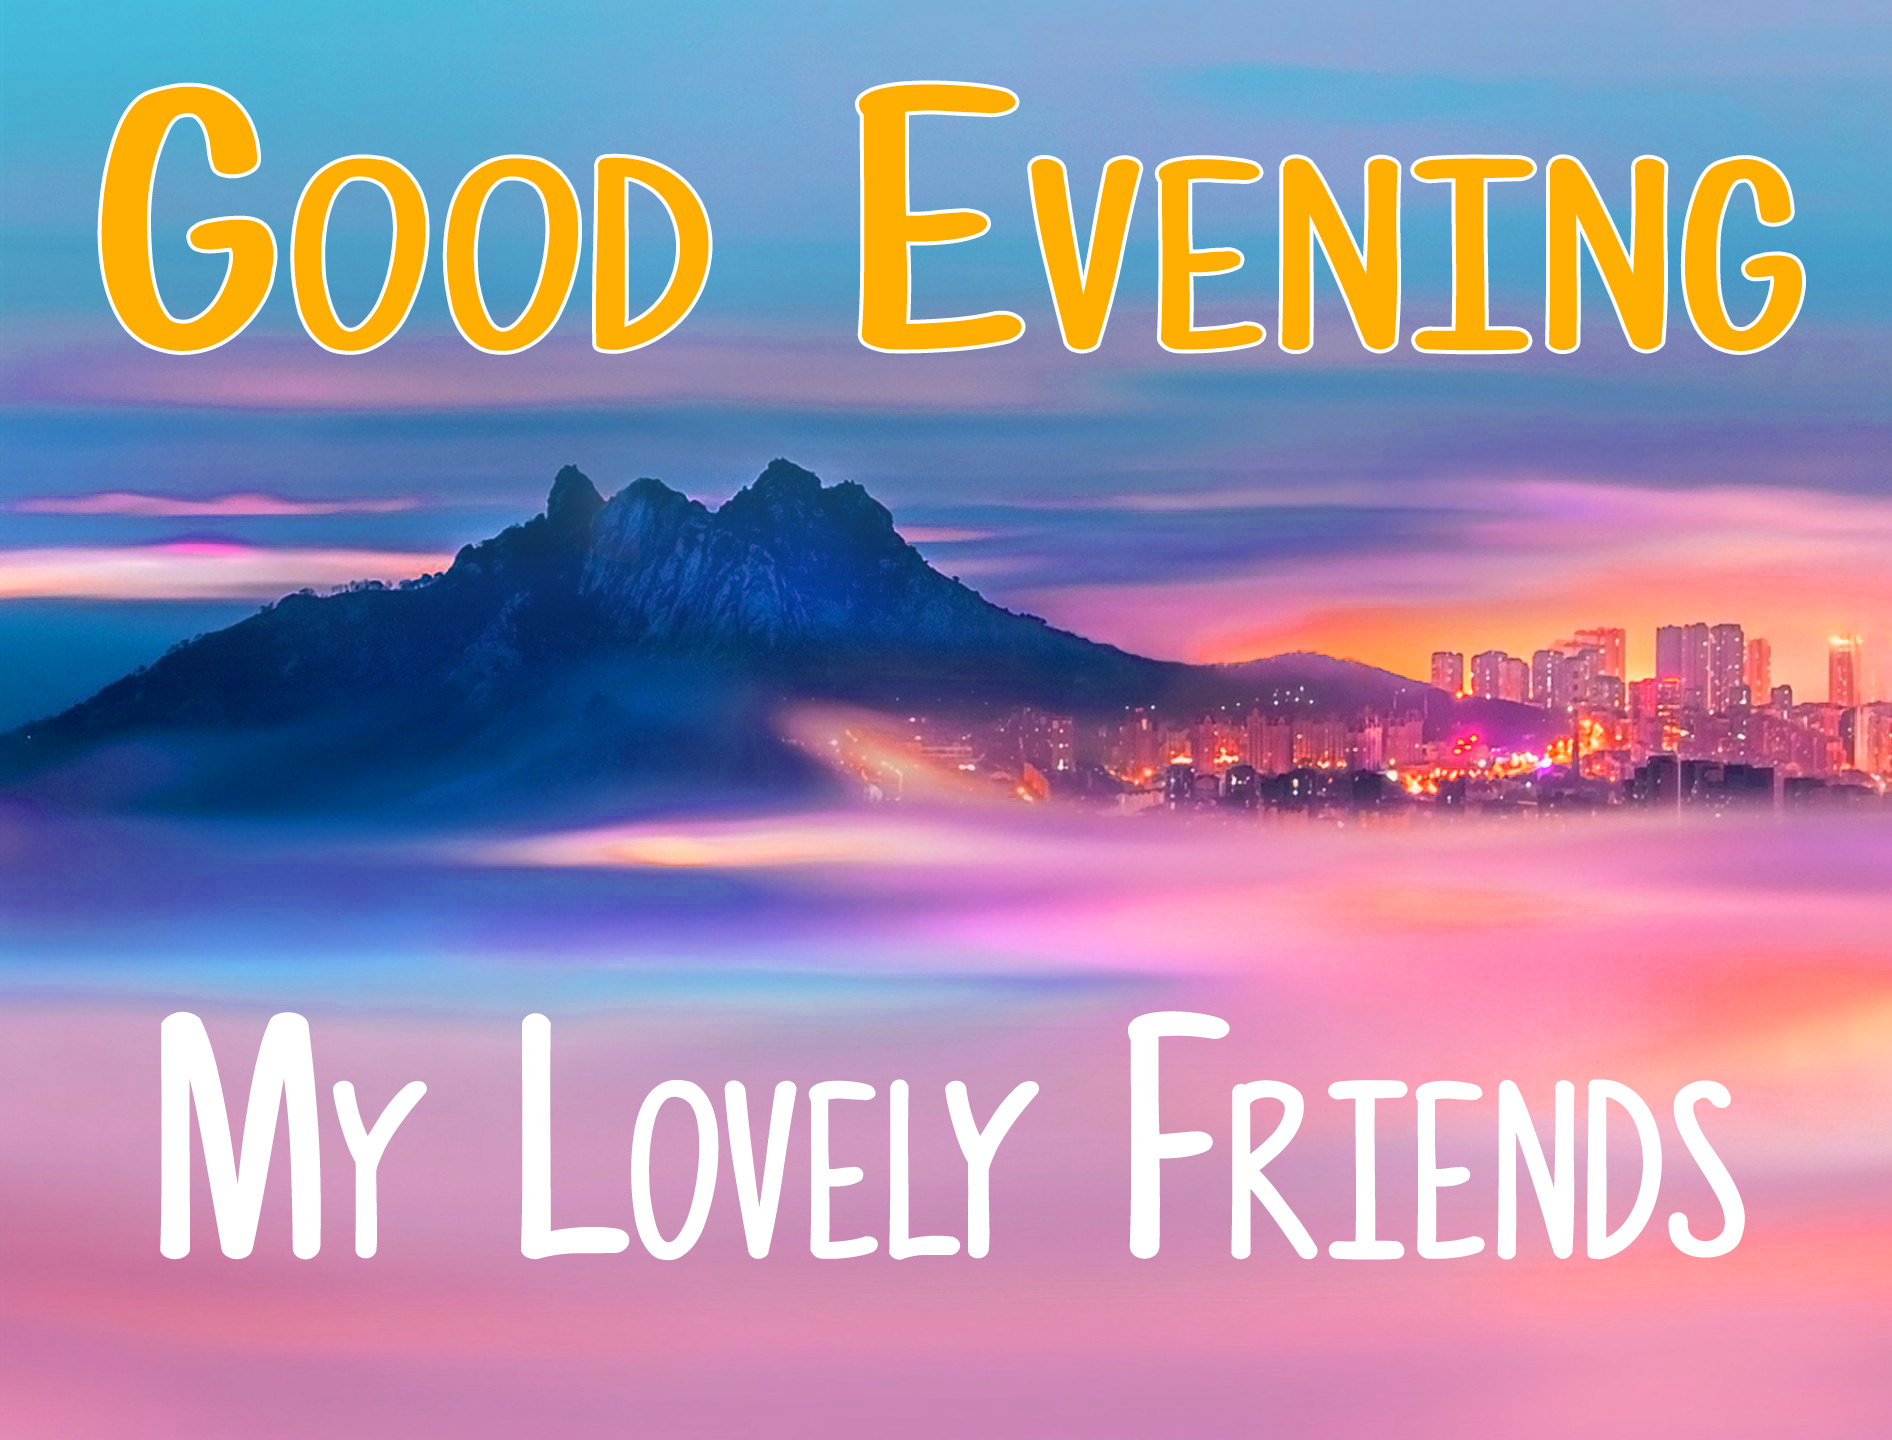 good evening photo 5